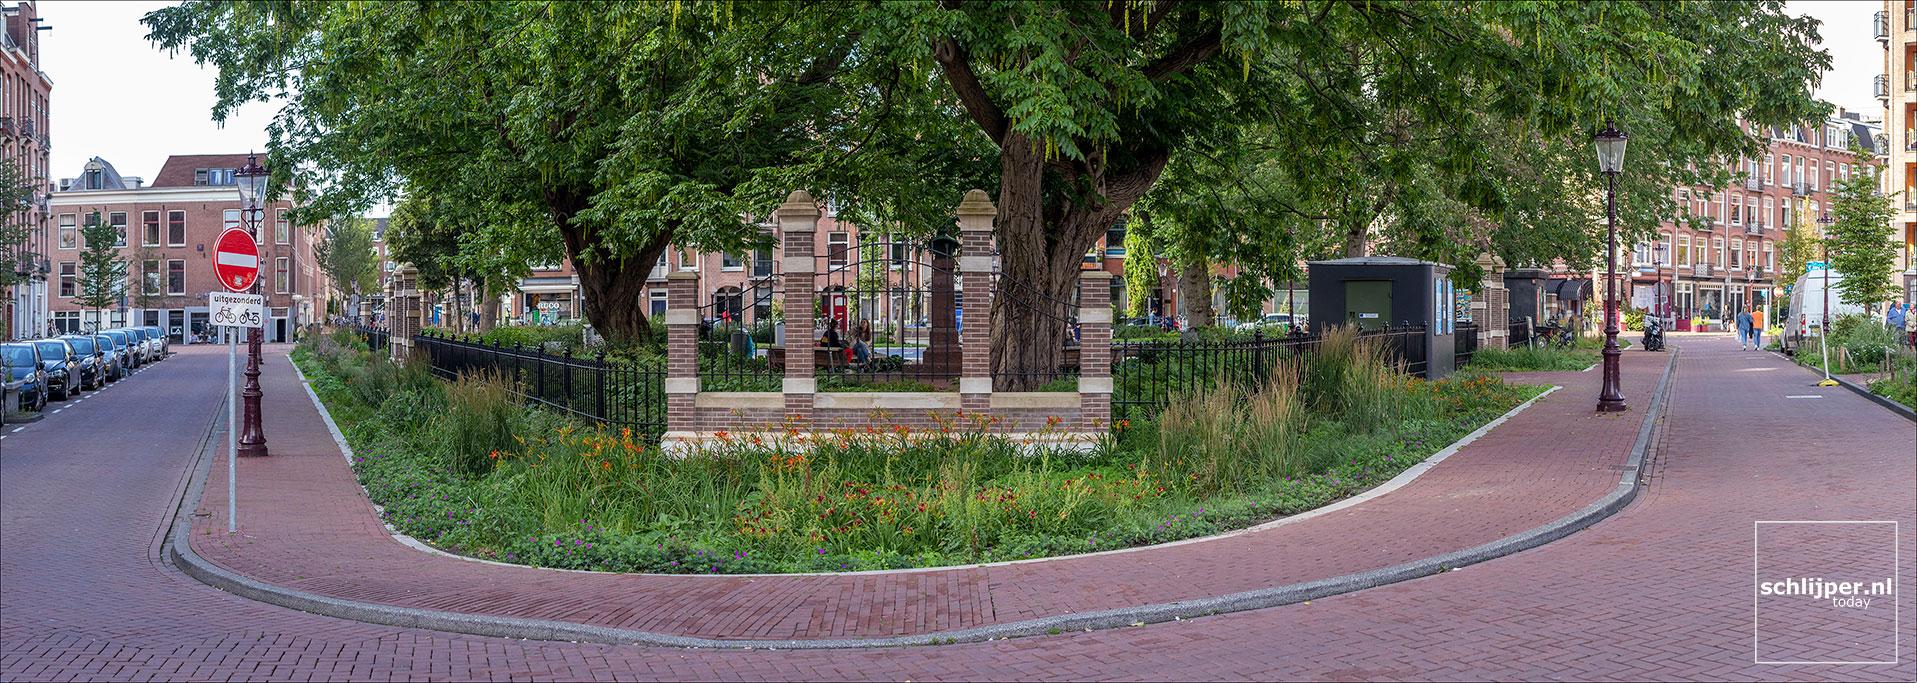 Nederland, Amsterdam, 10 juli 2020